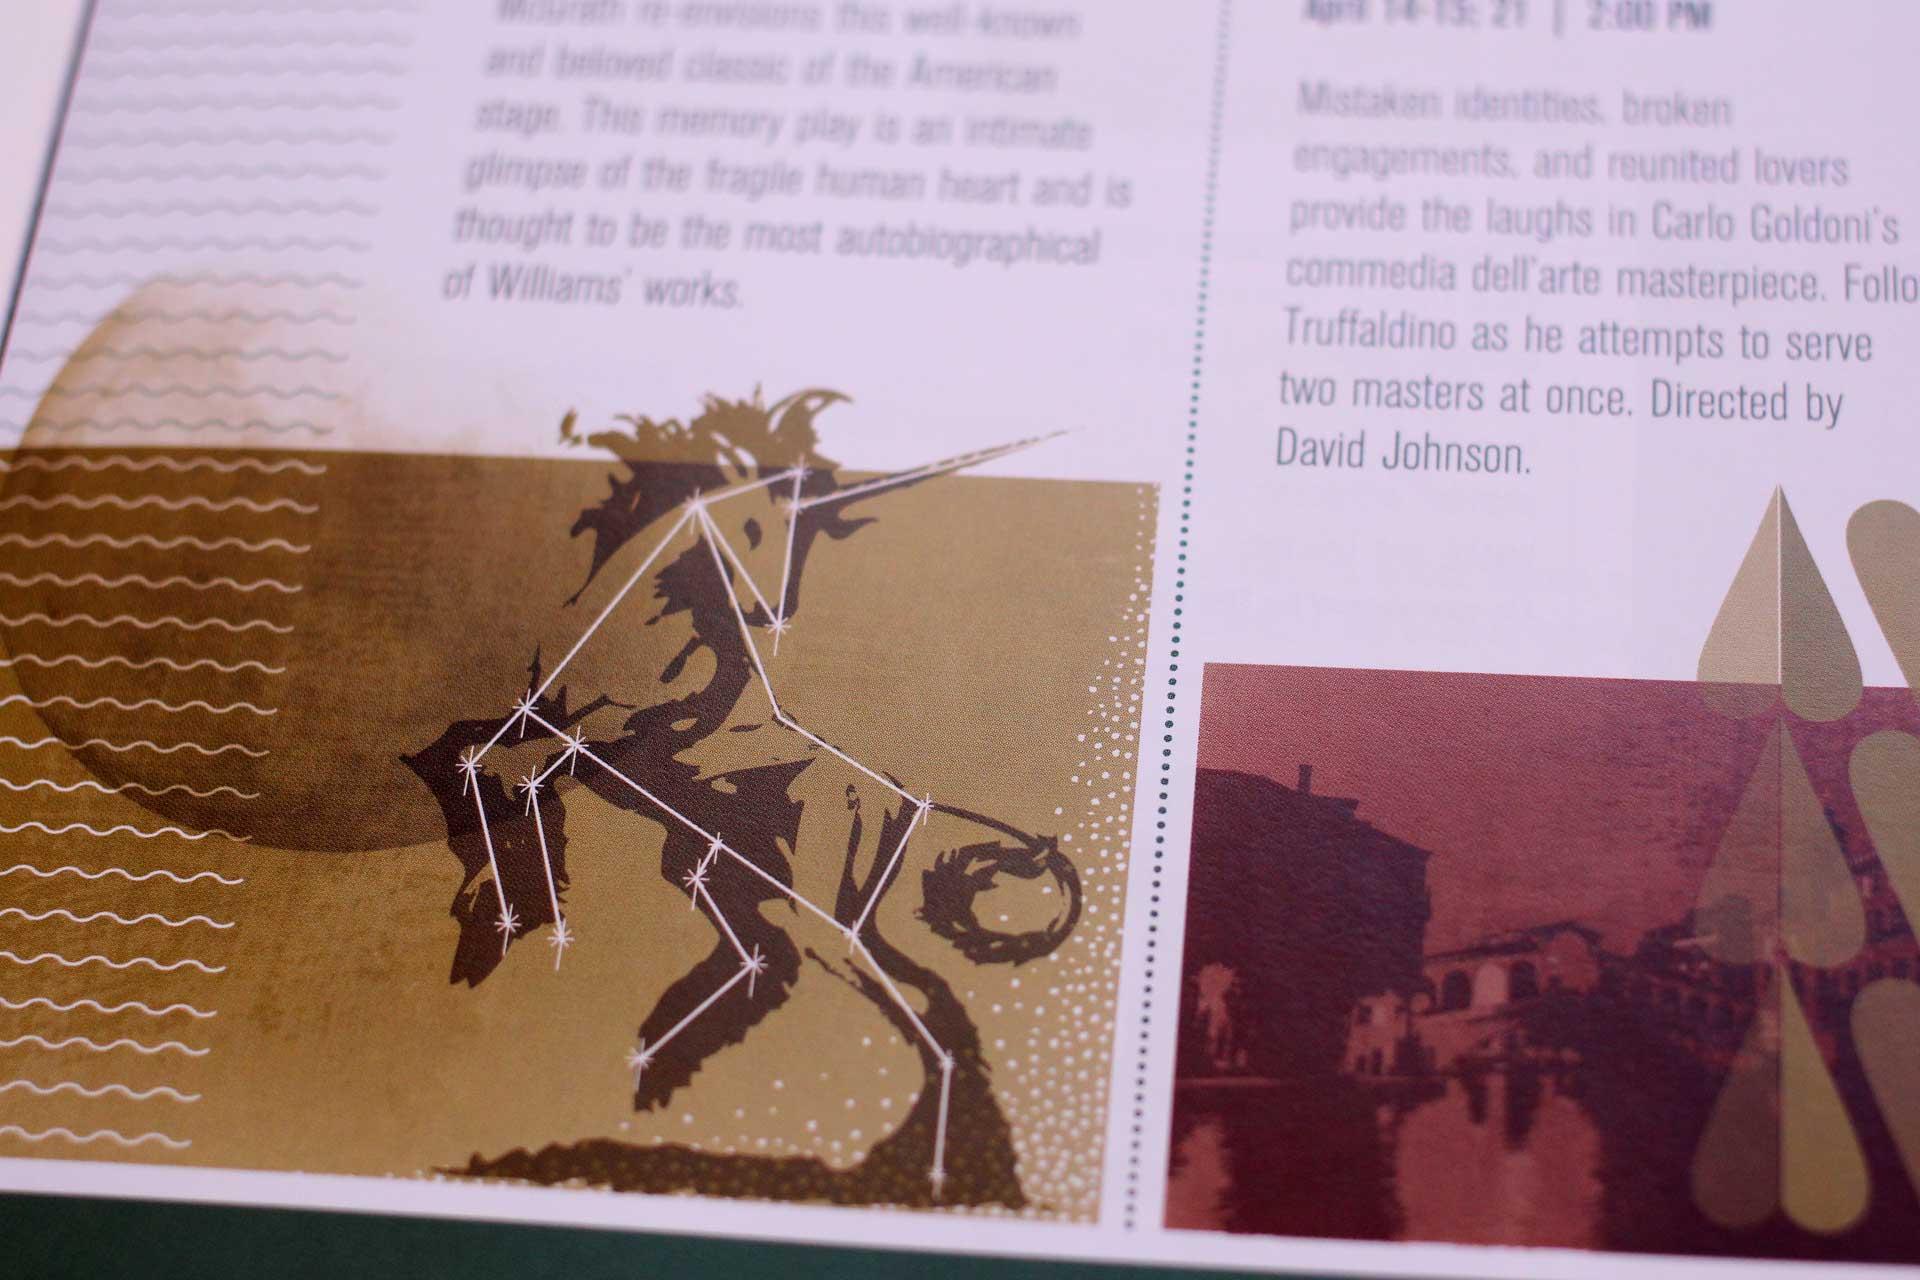 Virginia Tech School of Performing Arts brochure detail